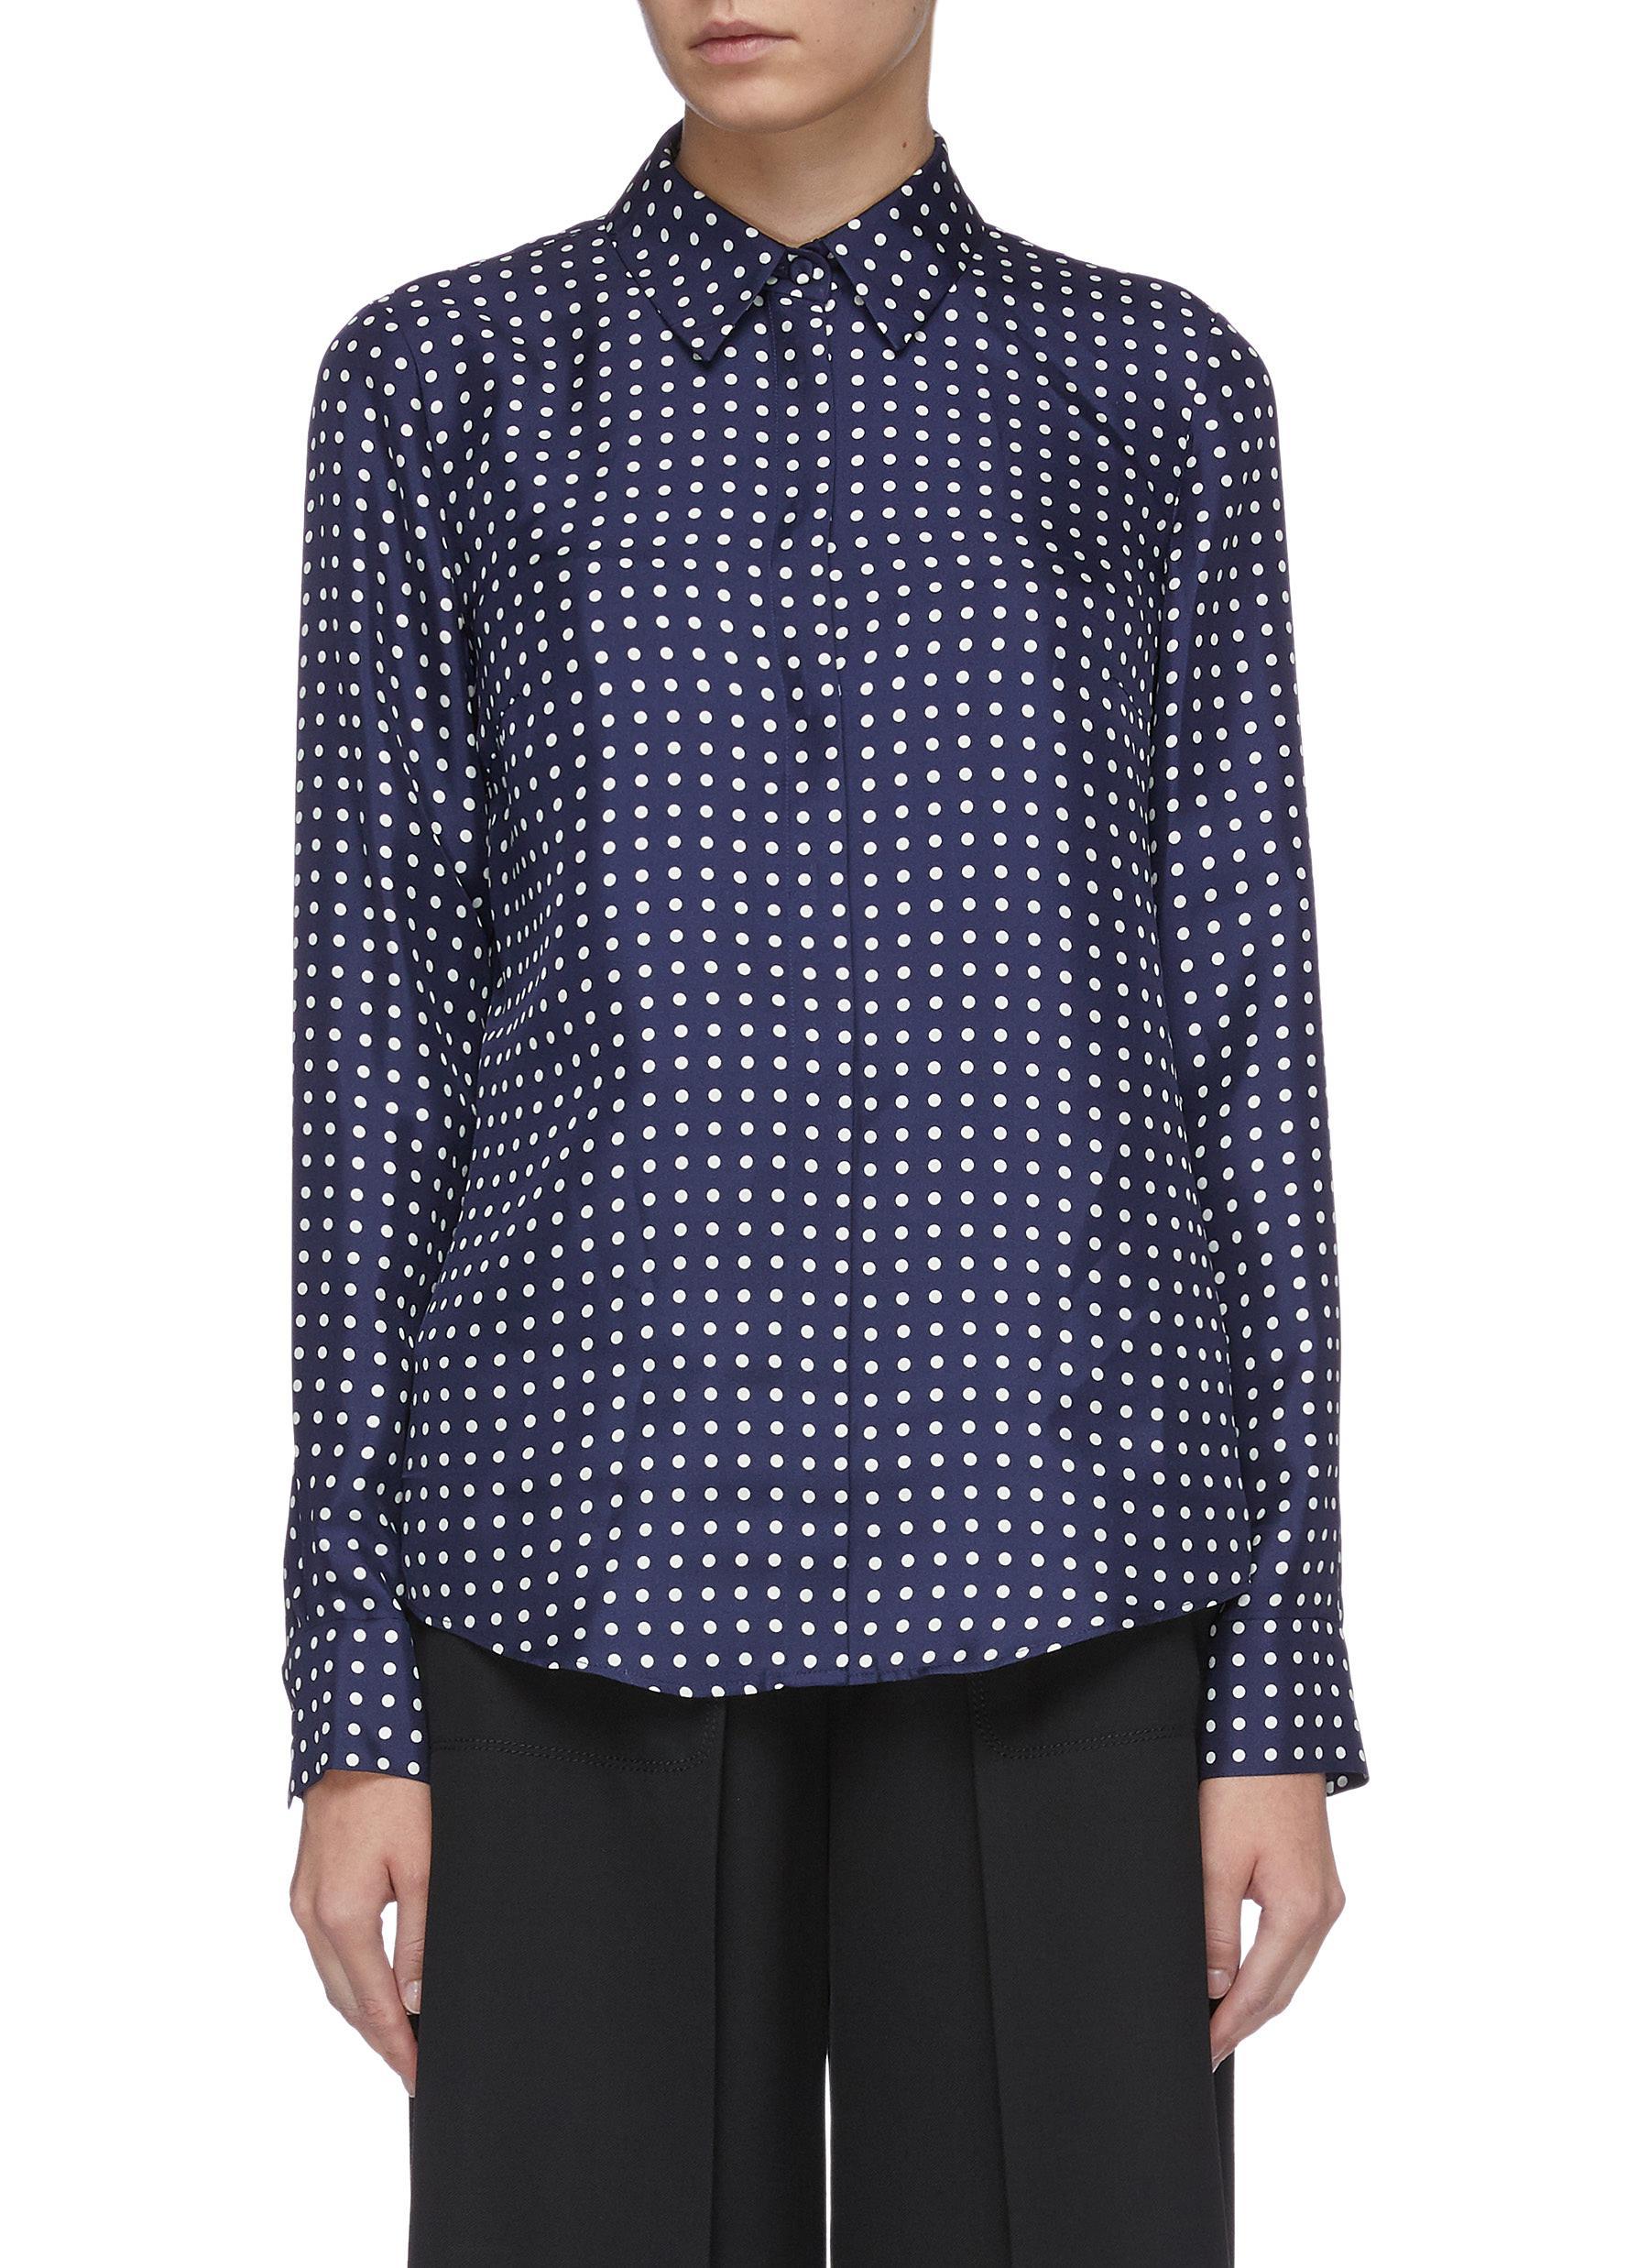 Henri polka dot print silk twill shirt by Gabriela Hearst